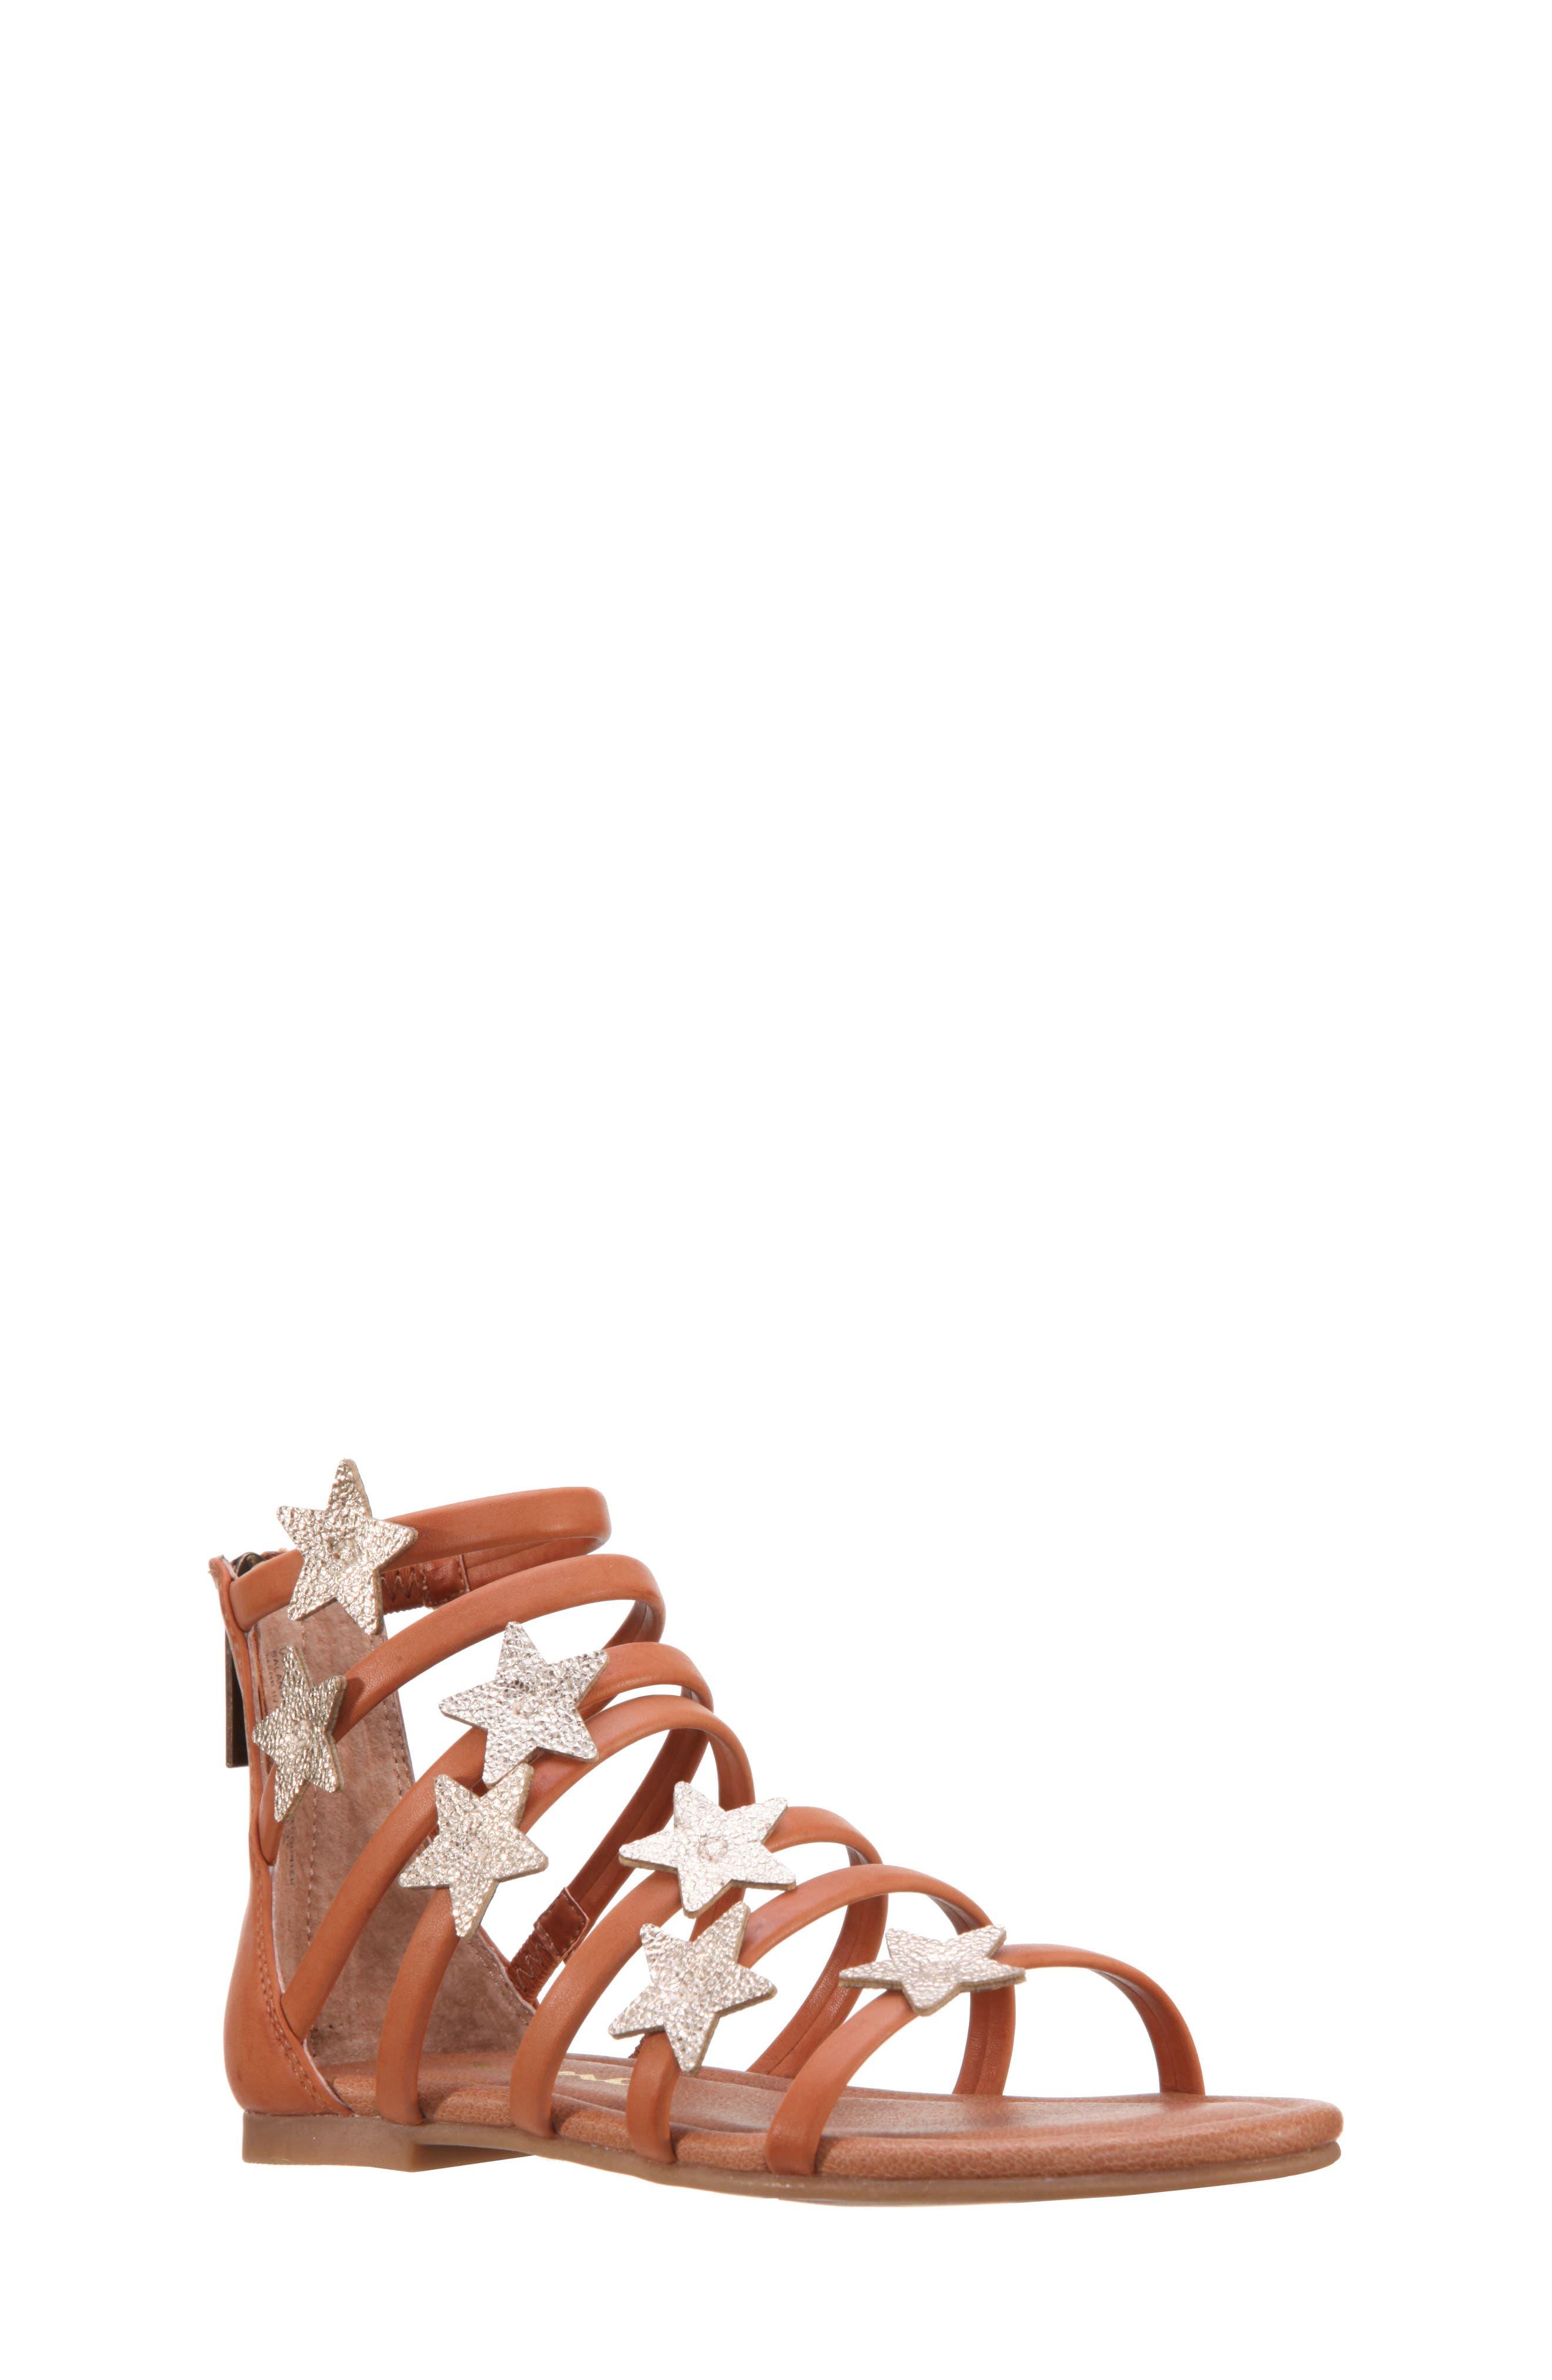 Robertha Gladiator Sandal,                             Main thumbnail 1, color,                             Tan Smooth/ Gold Metallic